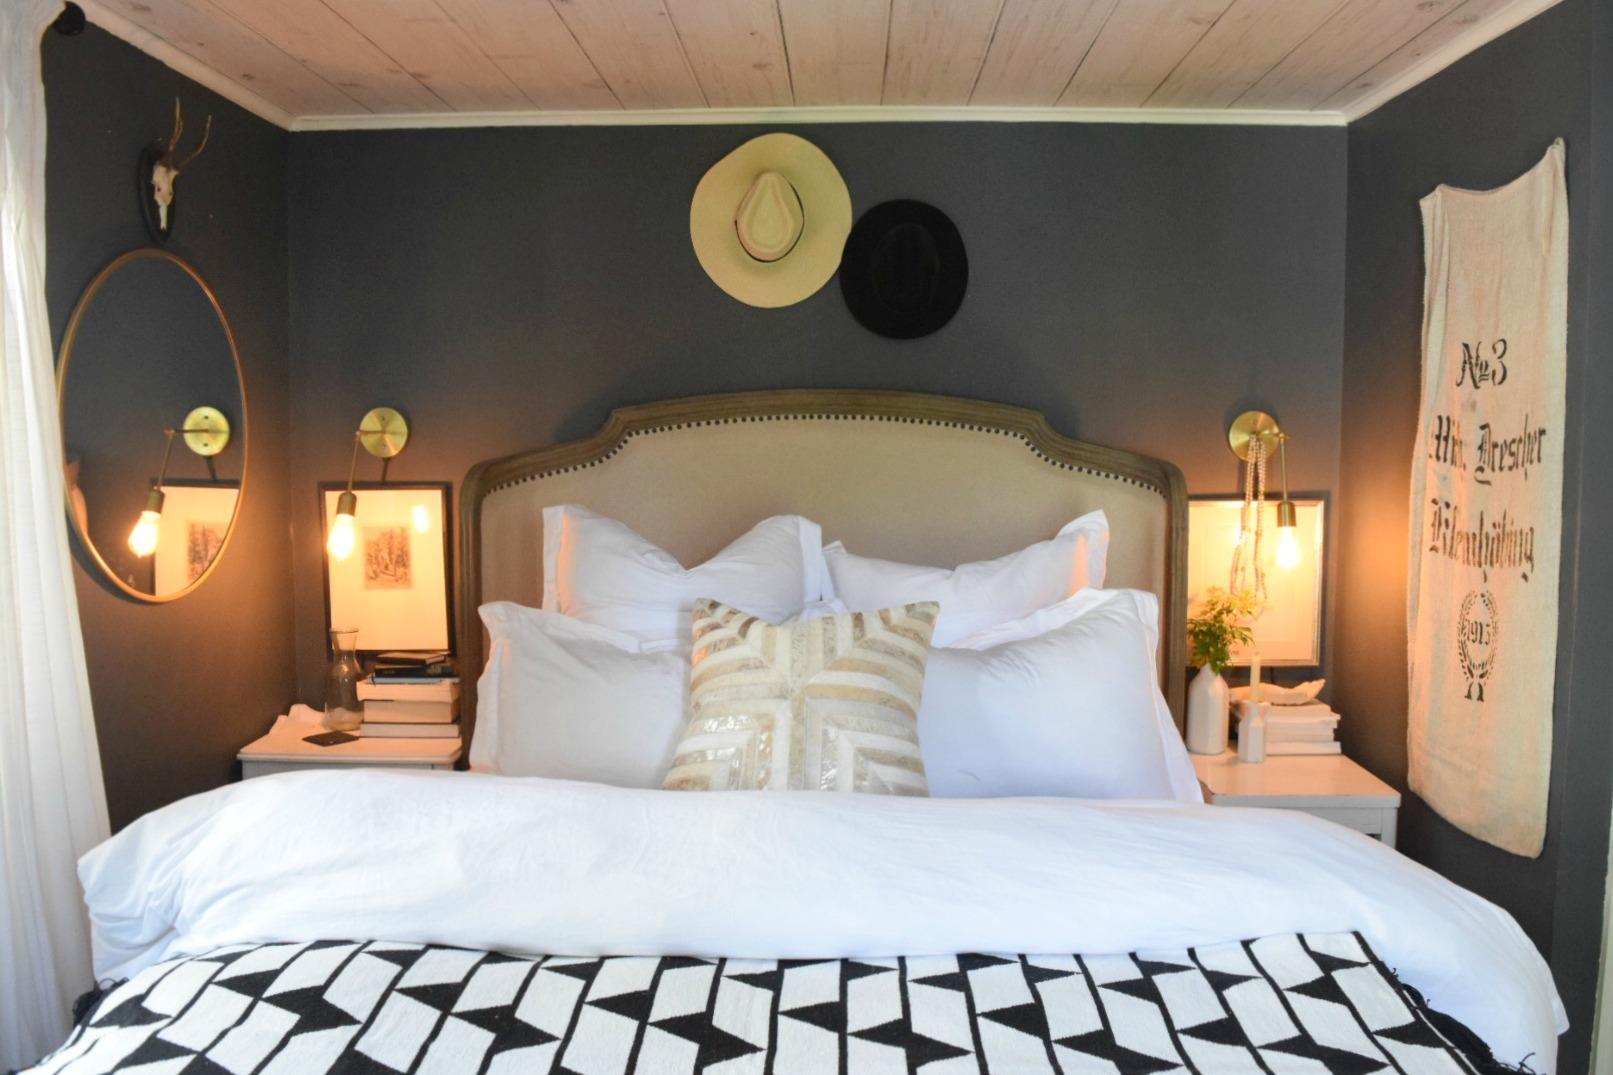 Target Mirror Idea 1 Master Bedroom